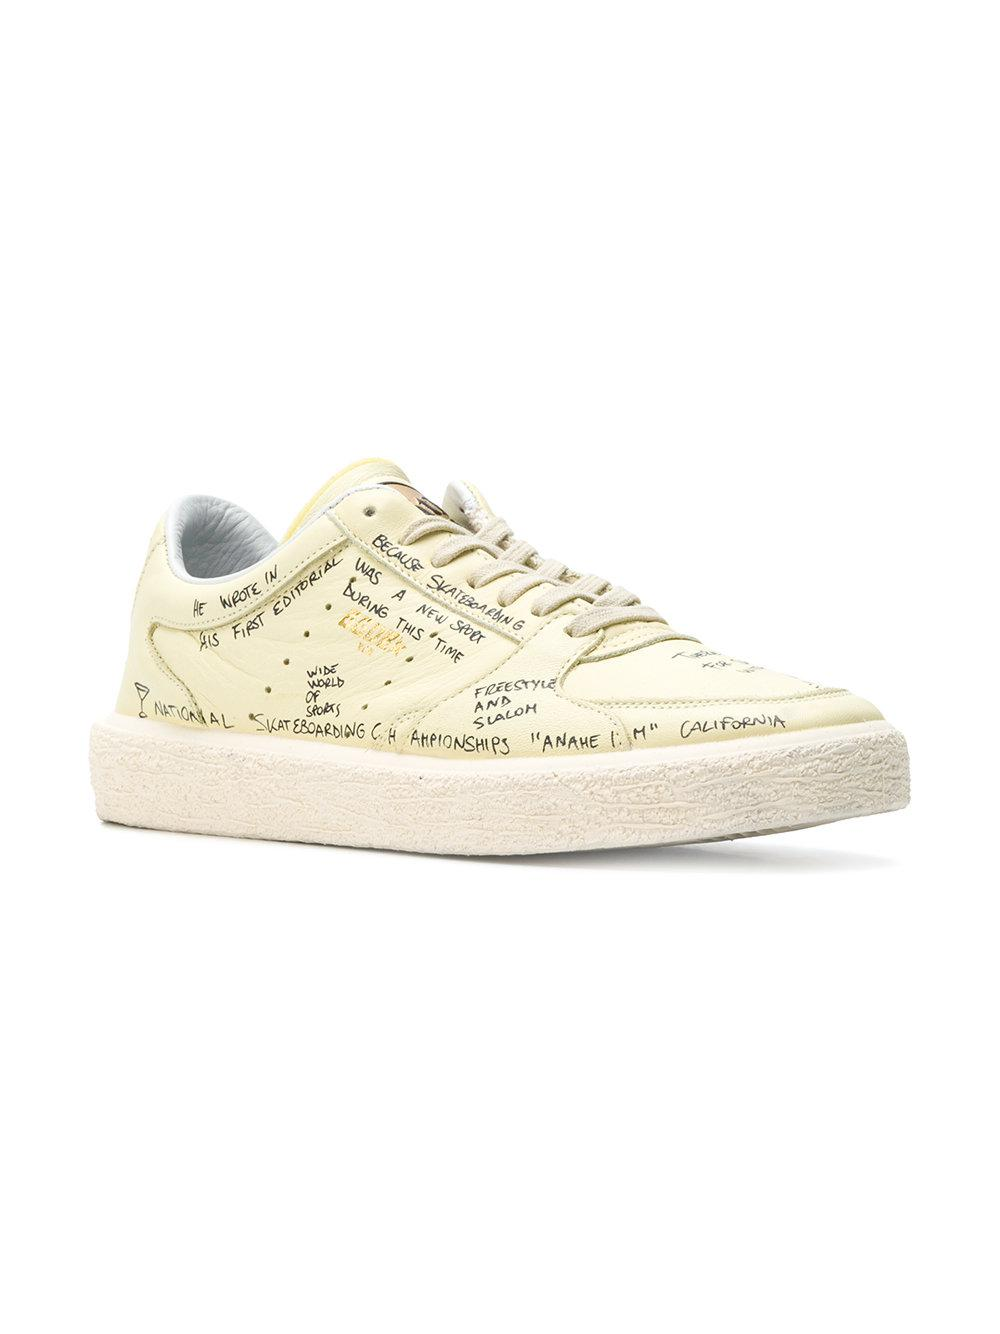 Tenthstar sneakers - Yellow & Orange Golden Goose 90V8Yw6